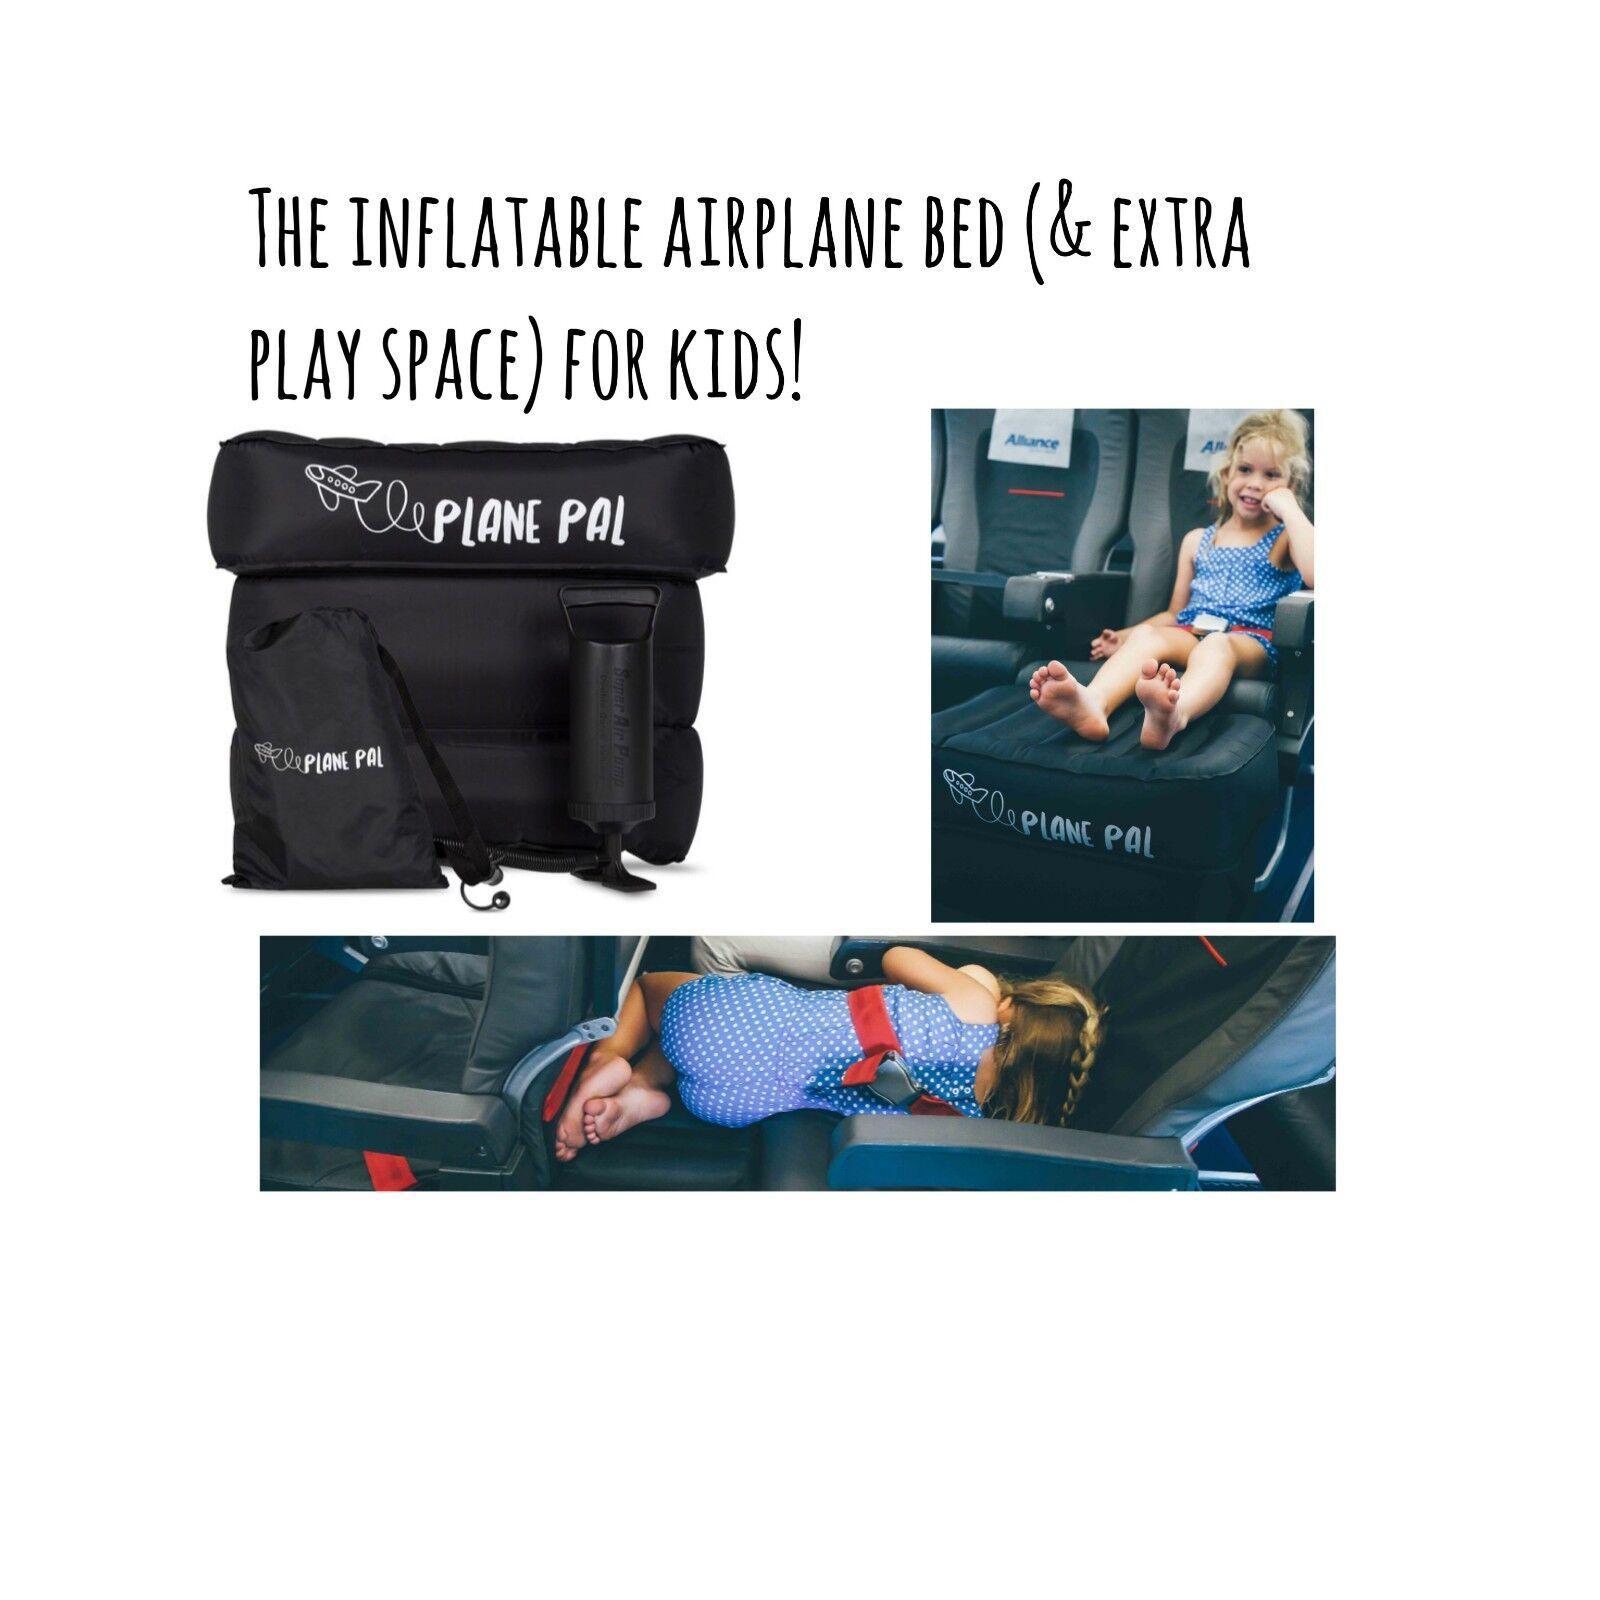 Piano PAL GONFIABILE SEAT Extender Bambini Aeroplano Aereo Cuscino legrest jetkids